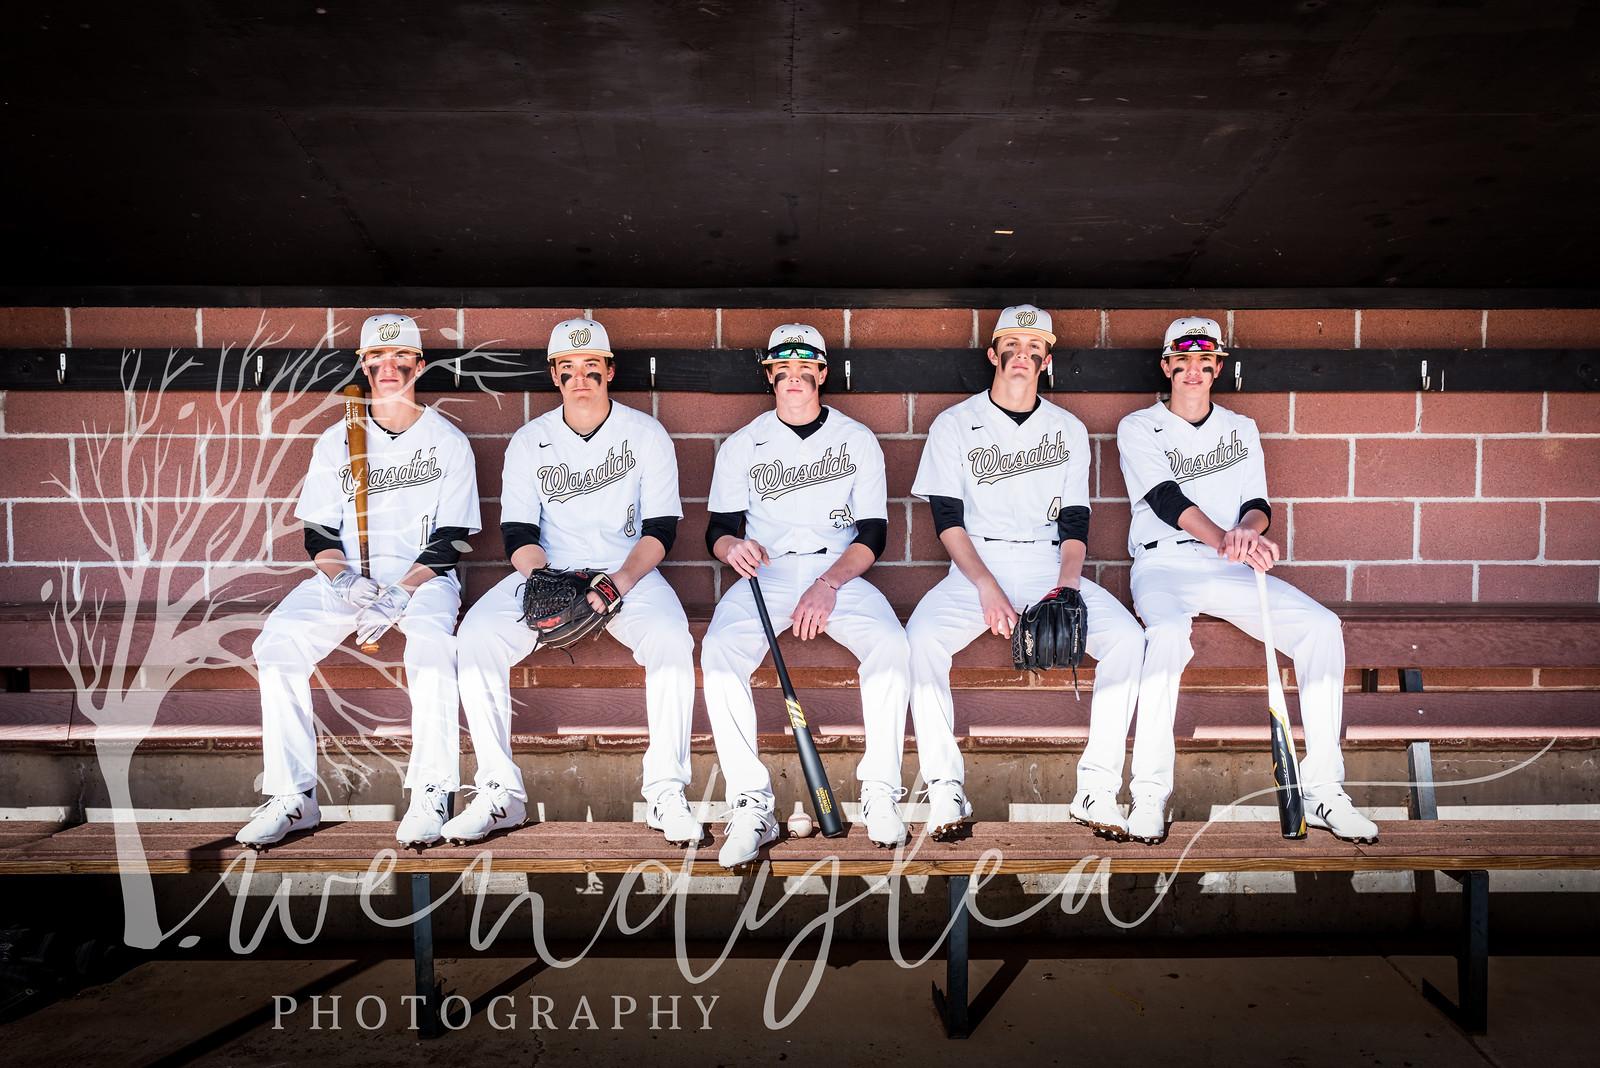 wlc Baseball Sen Boys 20181802018